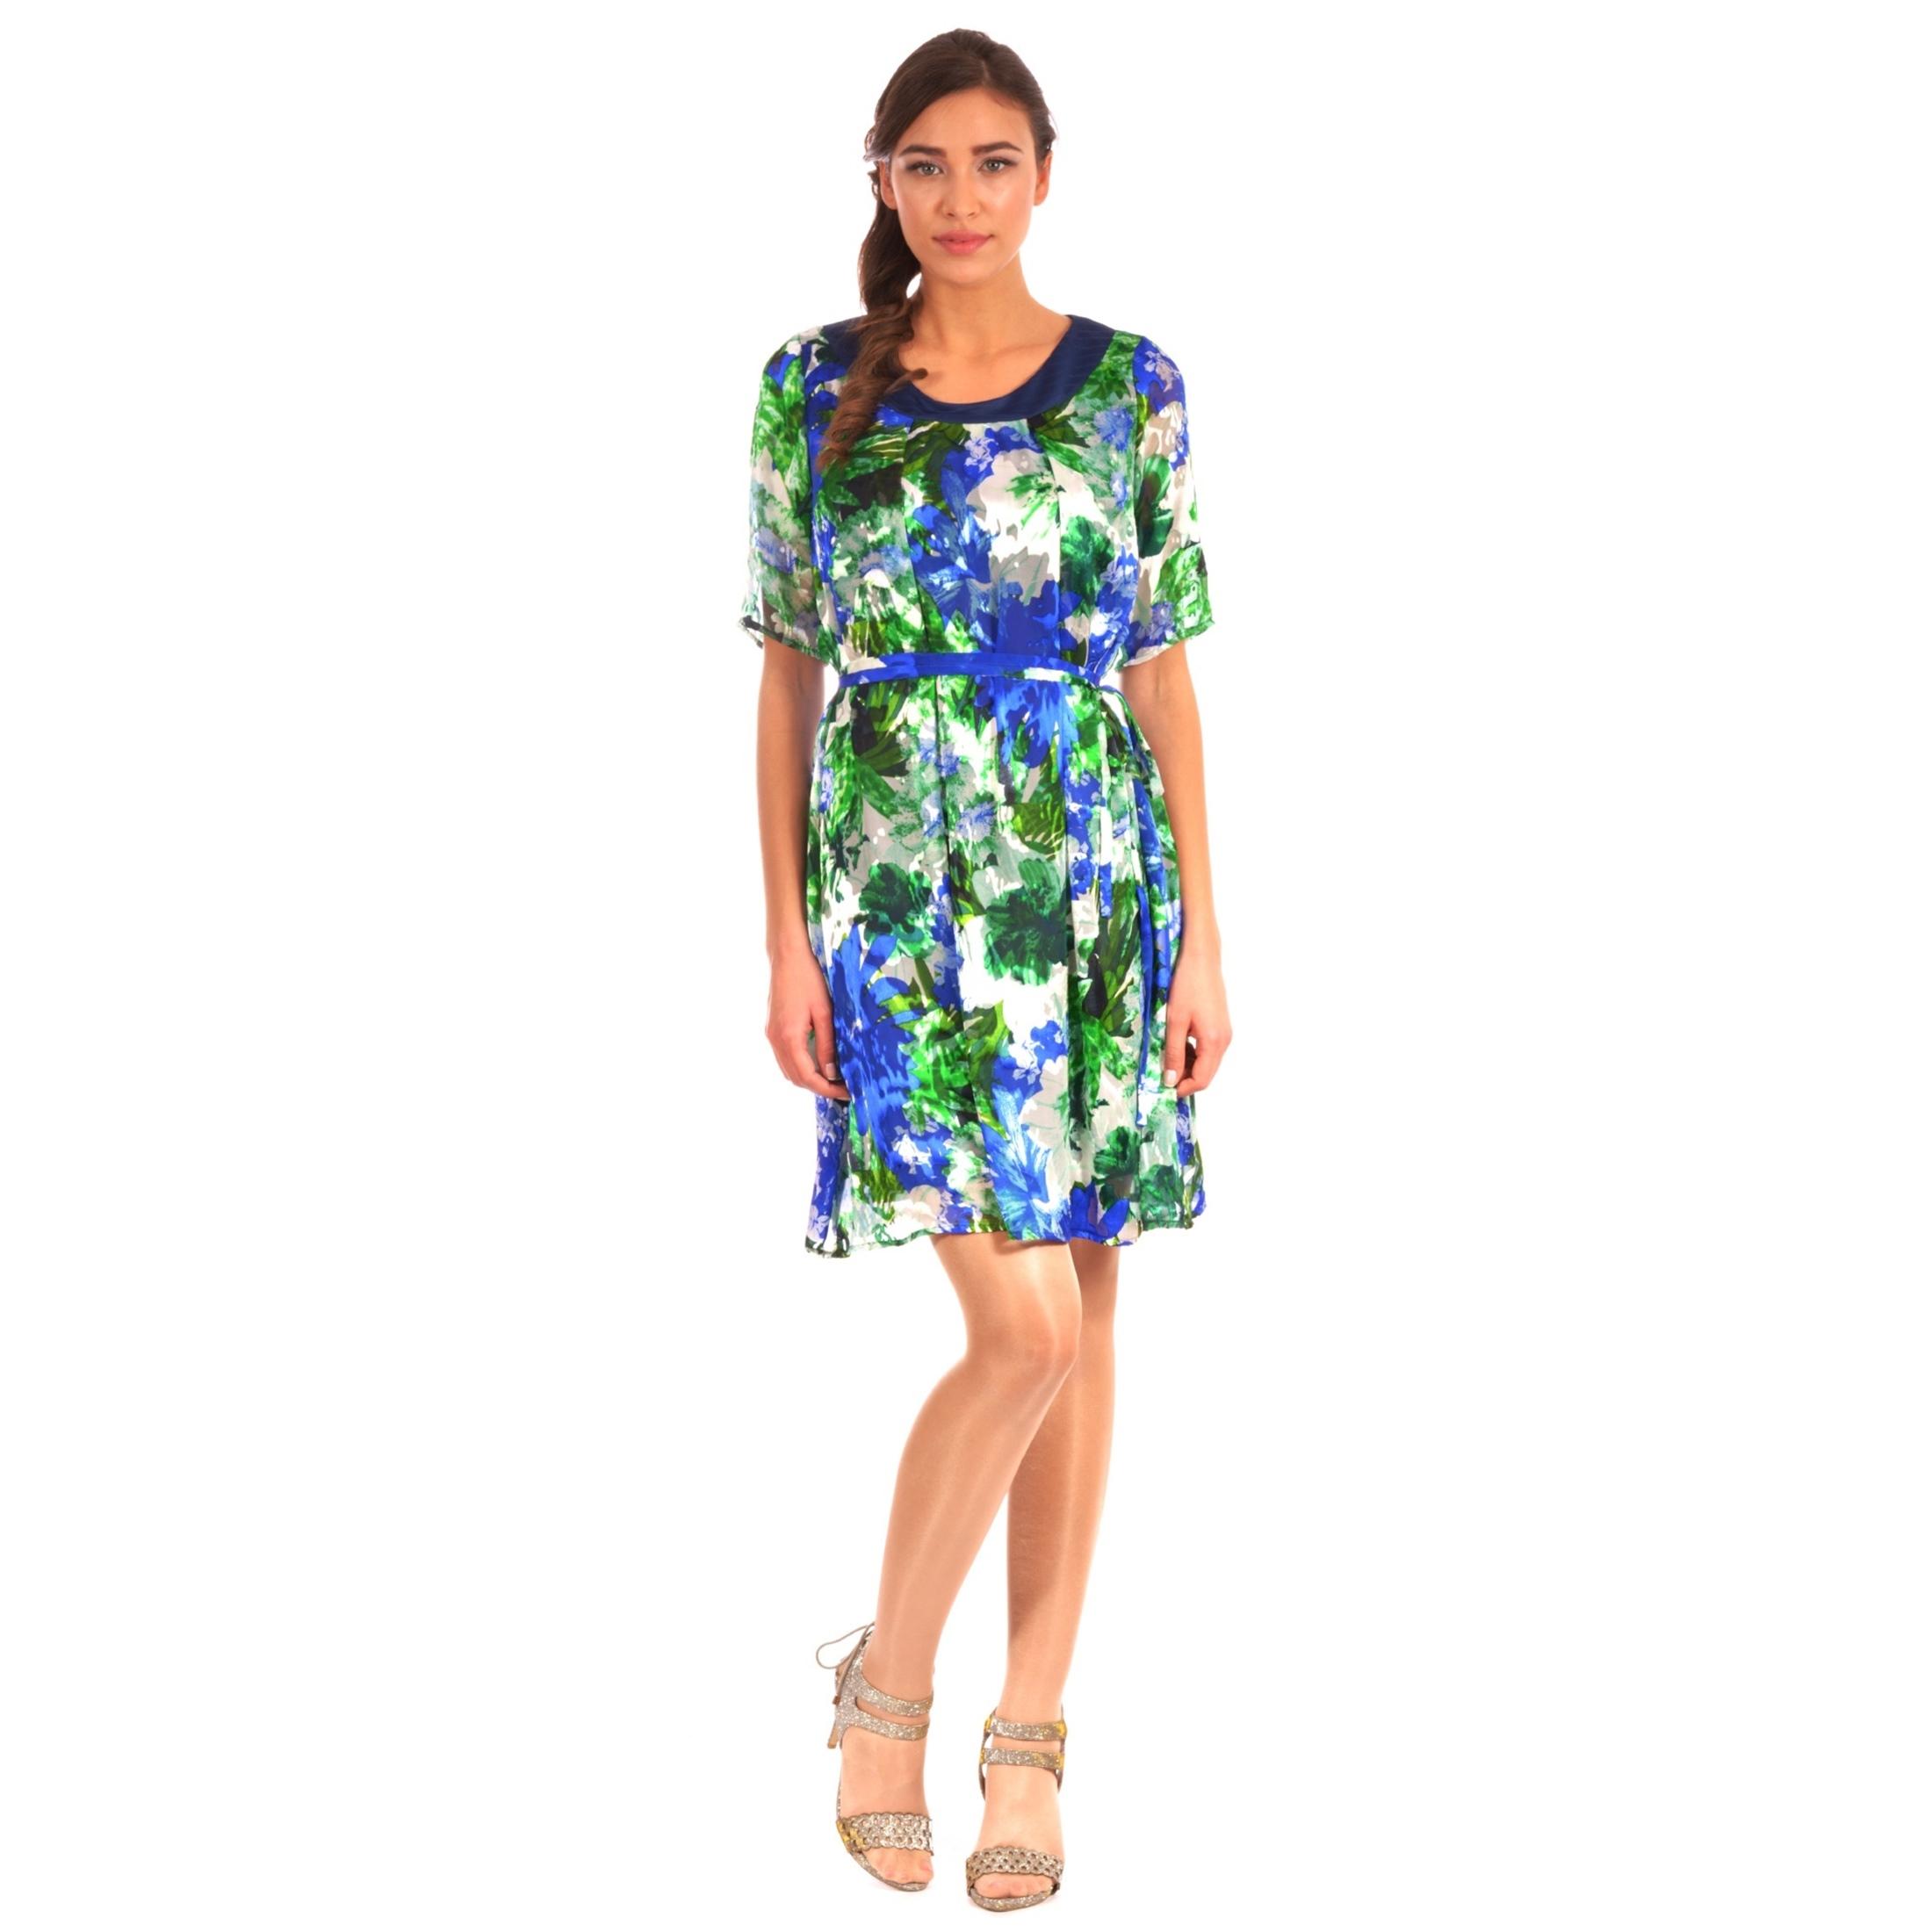 women's short colorful dress, ženska šarena haljina lady m